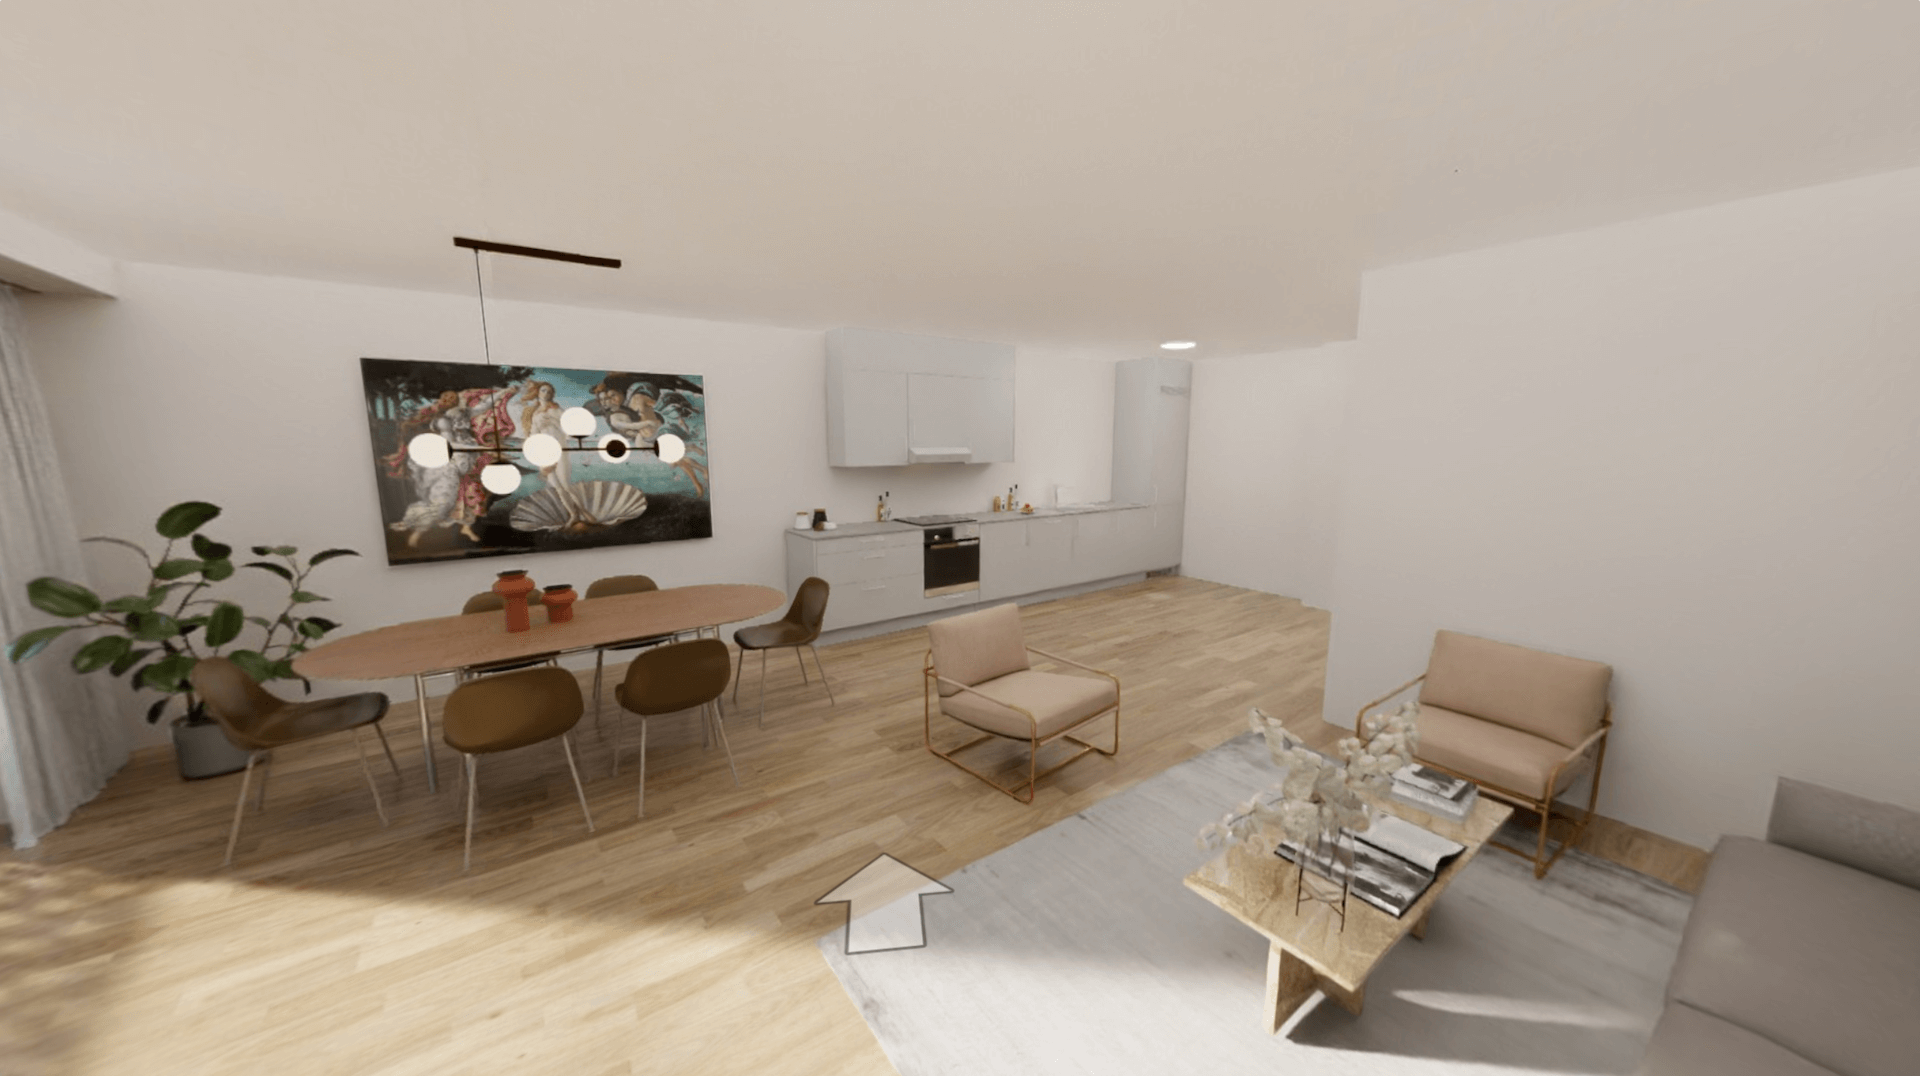 Automatically Visualized 3D Virtual Tour